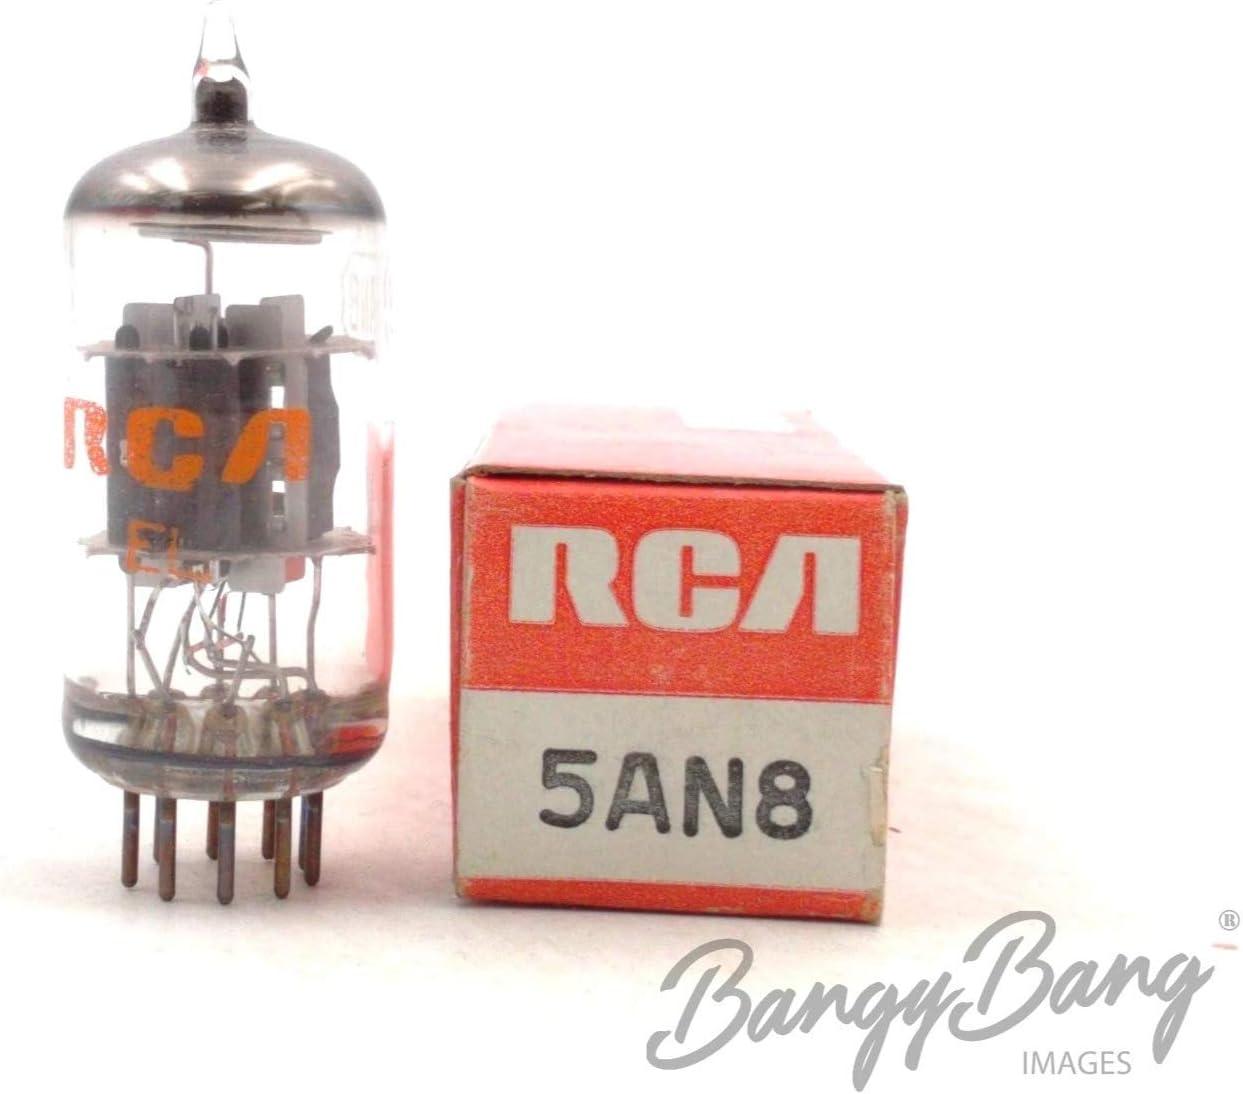 Valve Vintage RCA 5AN8 Triode Pentode Vintage Sunn//Ampeg Amp BangyBang Tubes